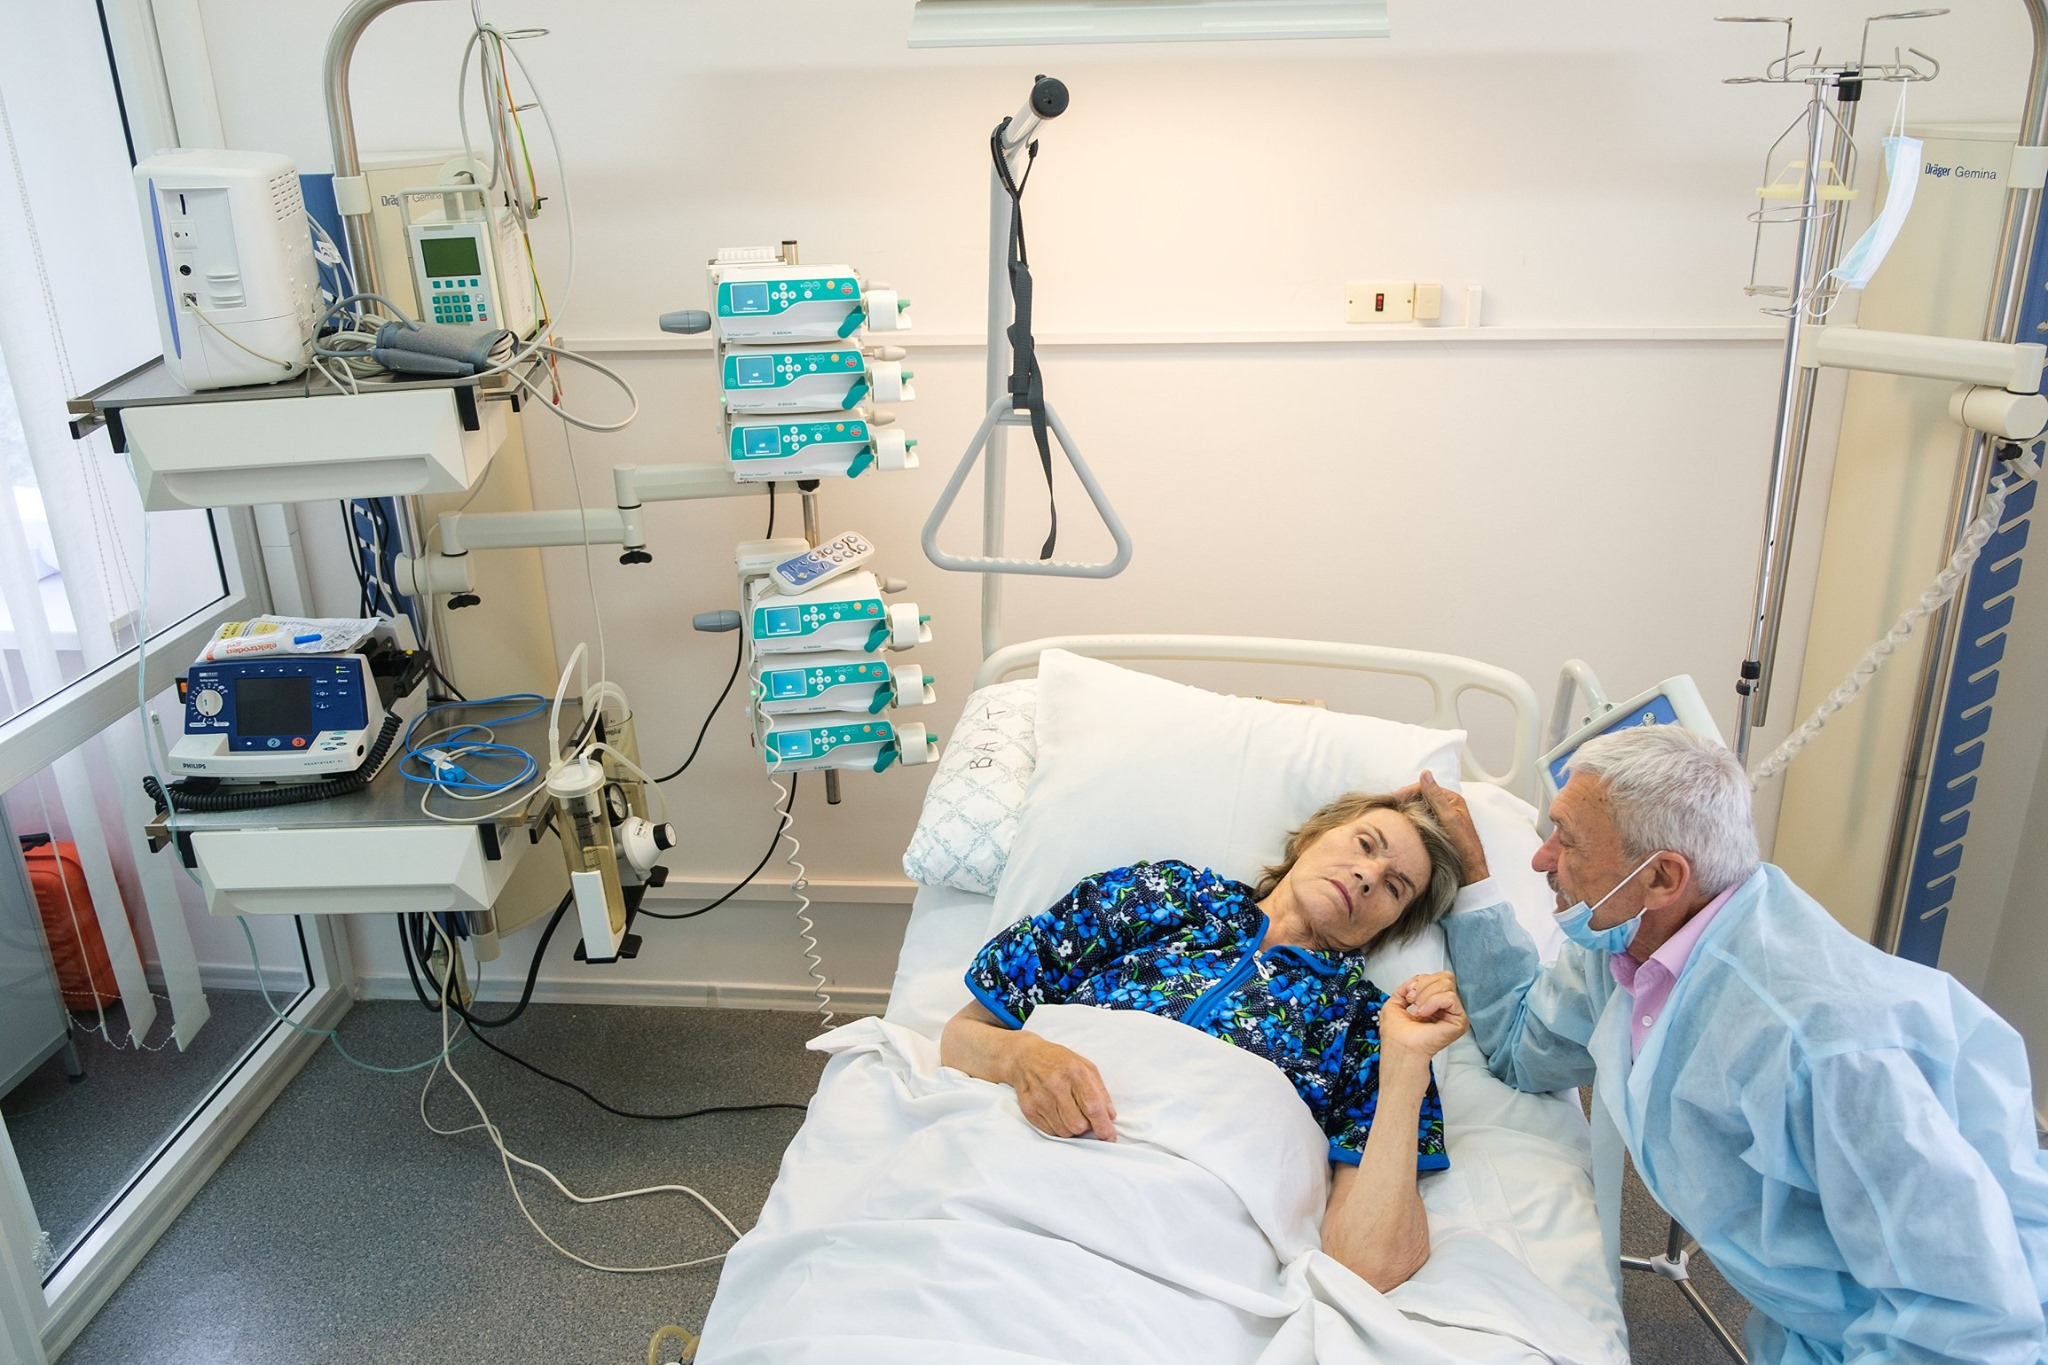 4,5-килограммовую опухоль удалили врачи из Феофании